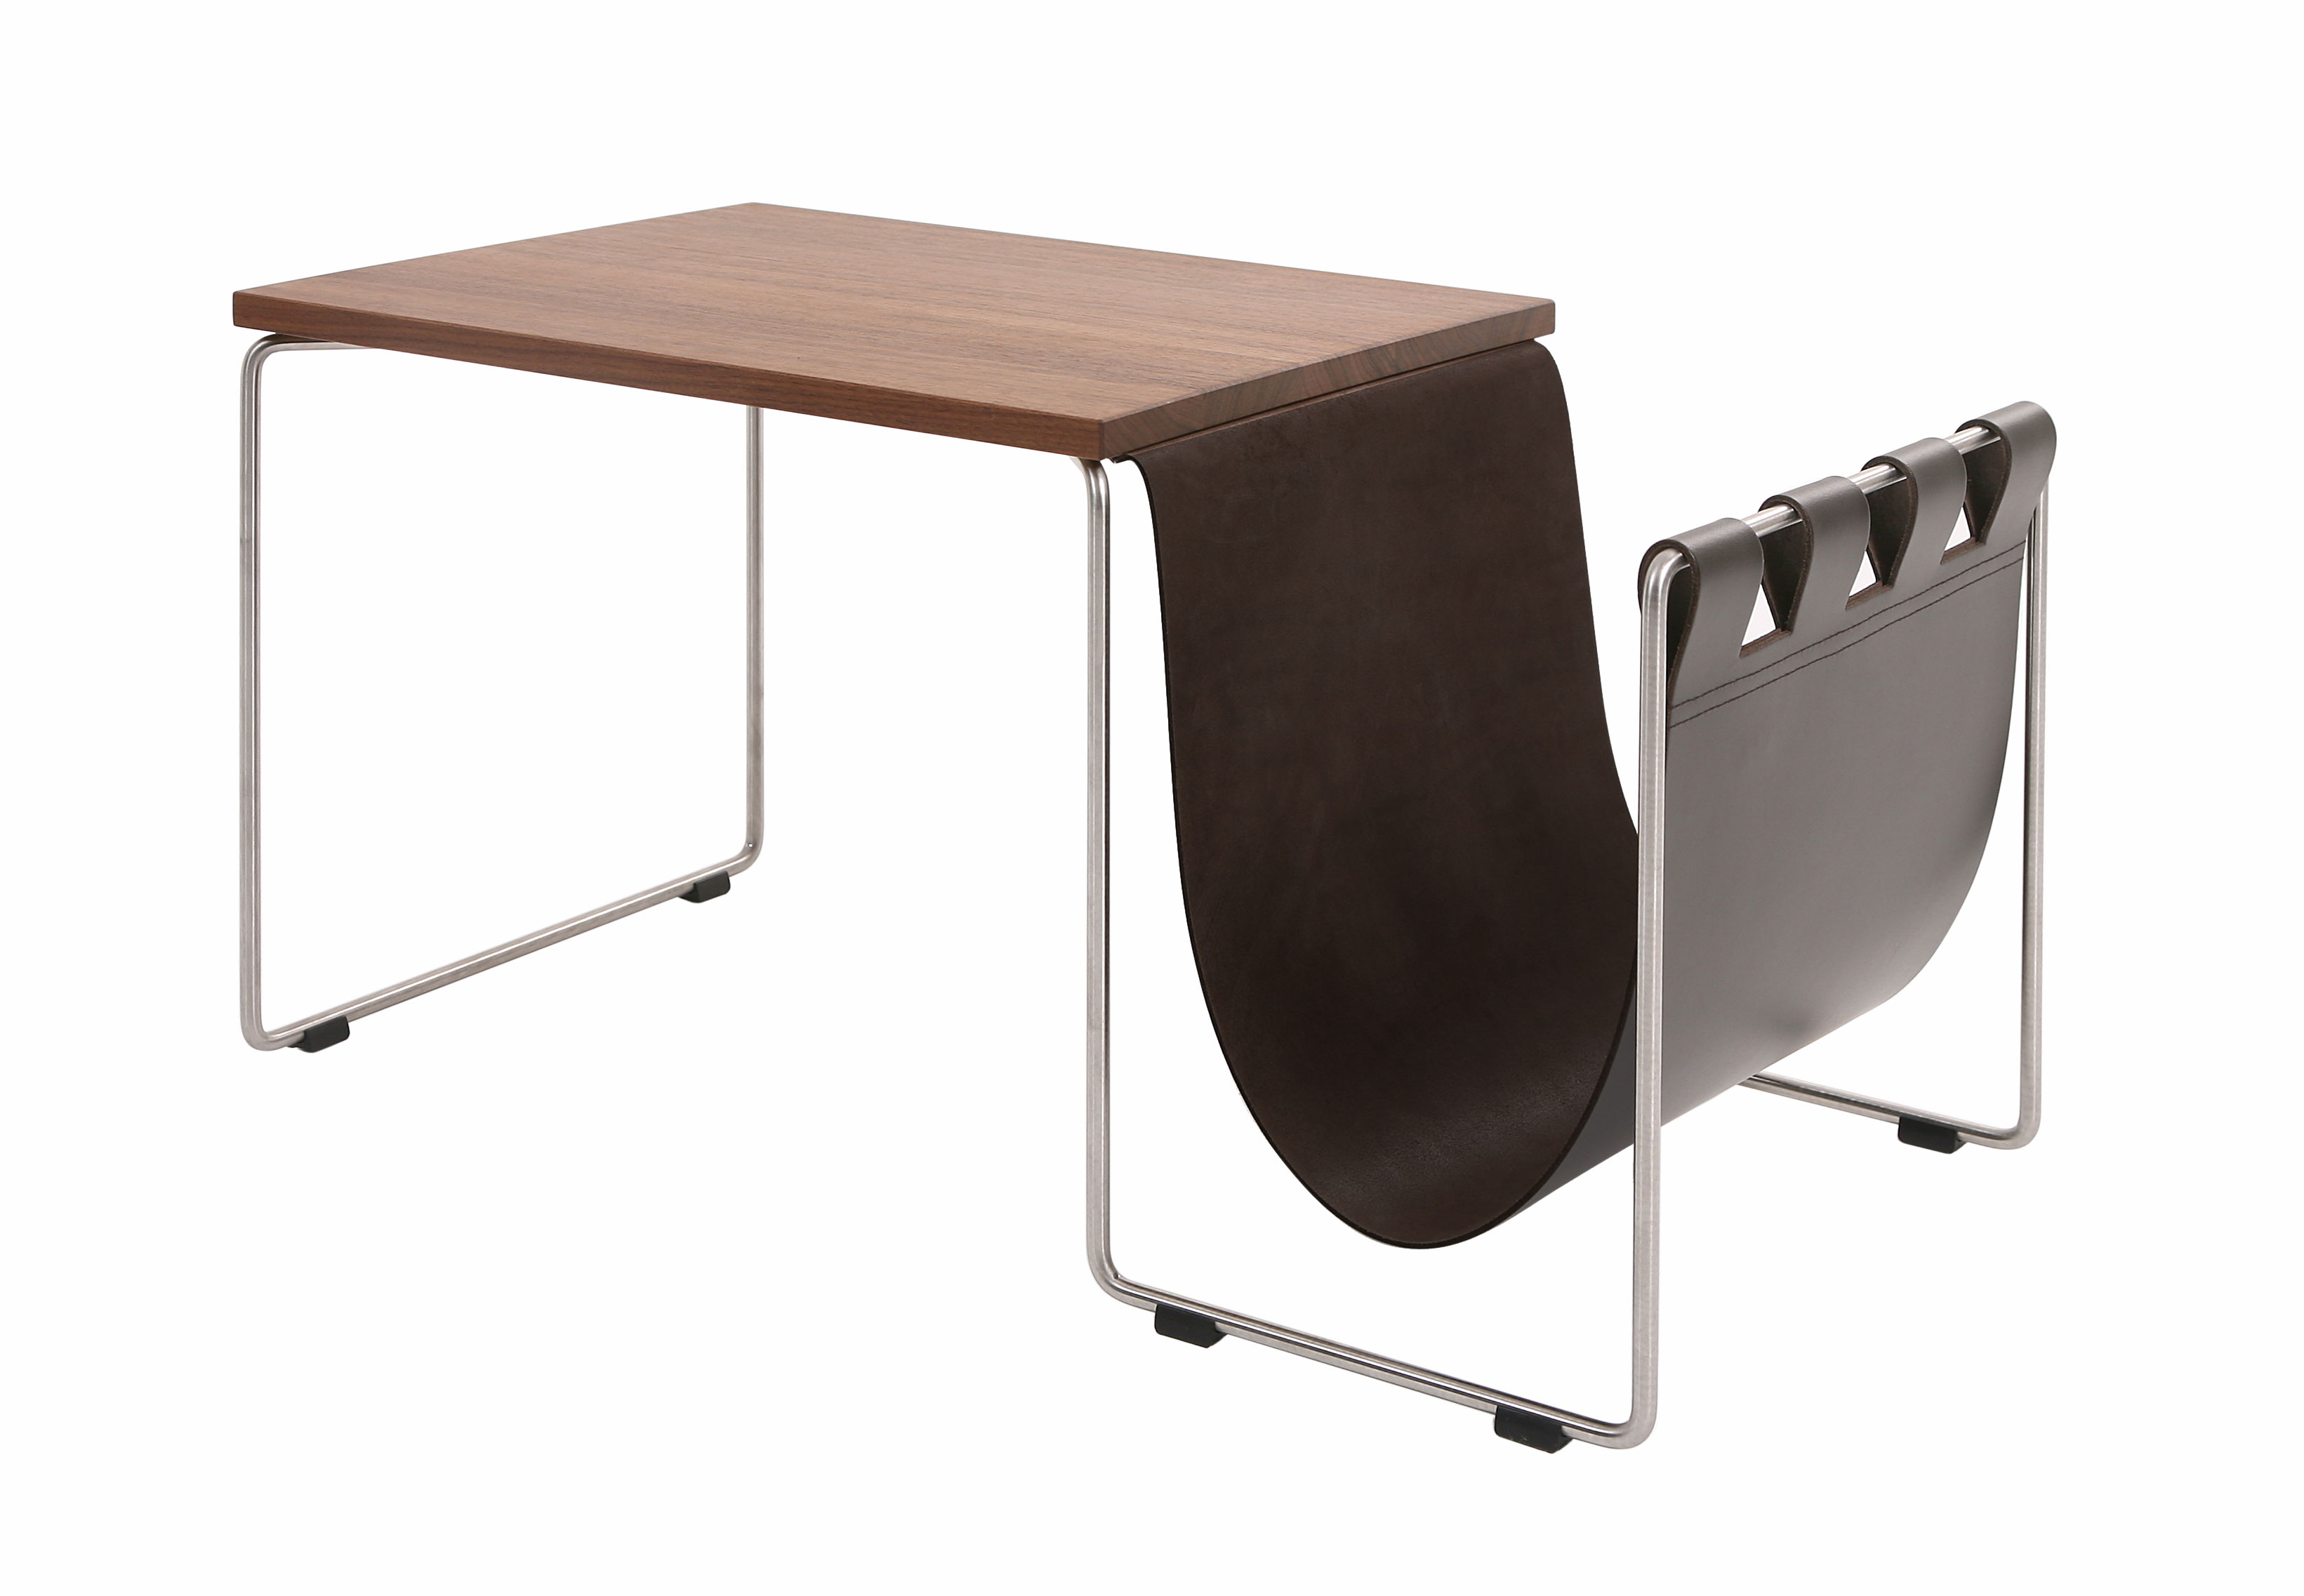 couchtisch kff 11145620171027. Black Bedroom Furniture Sets. Home Design Ideas